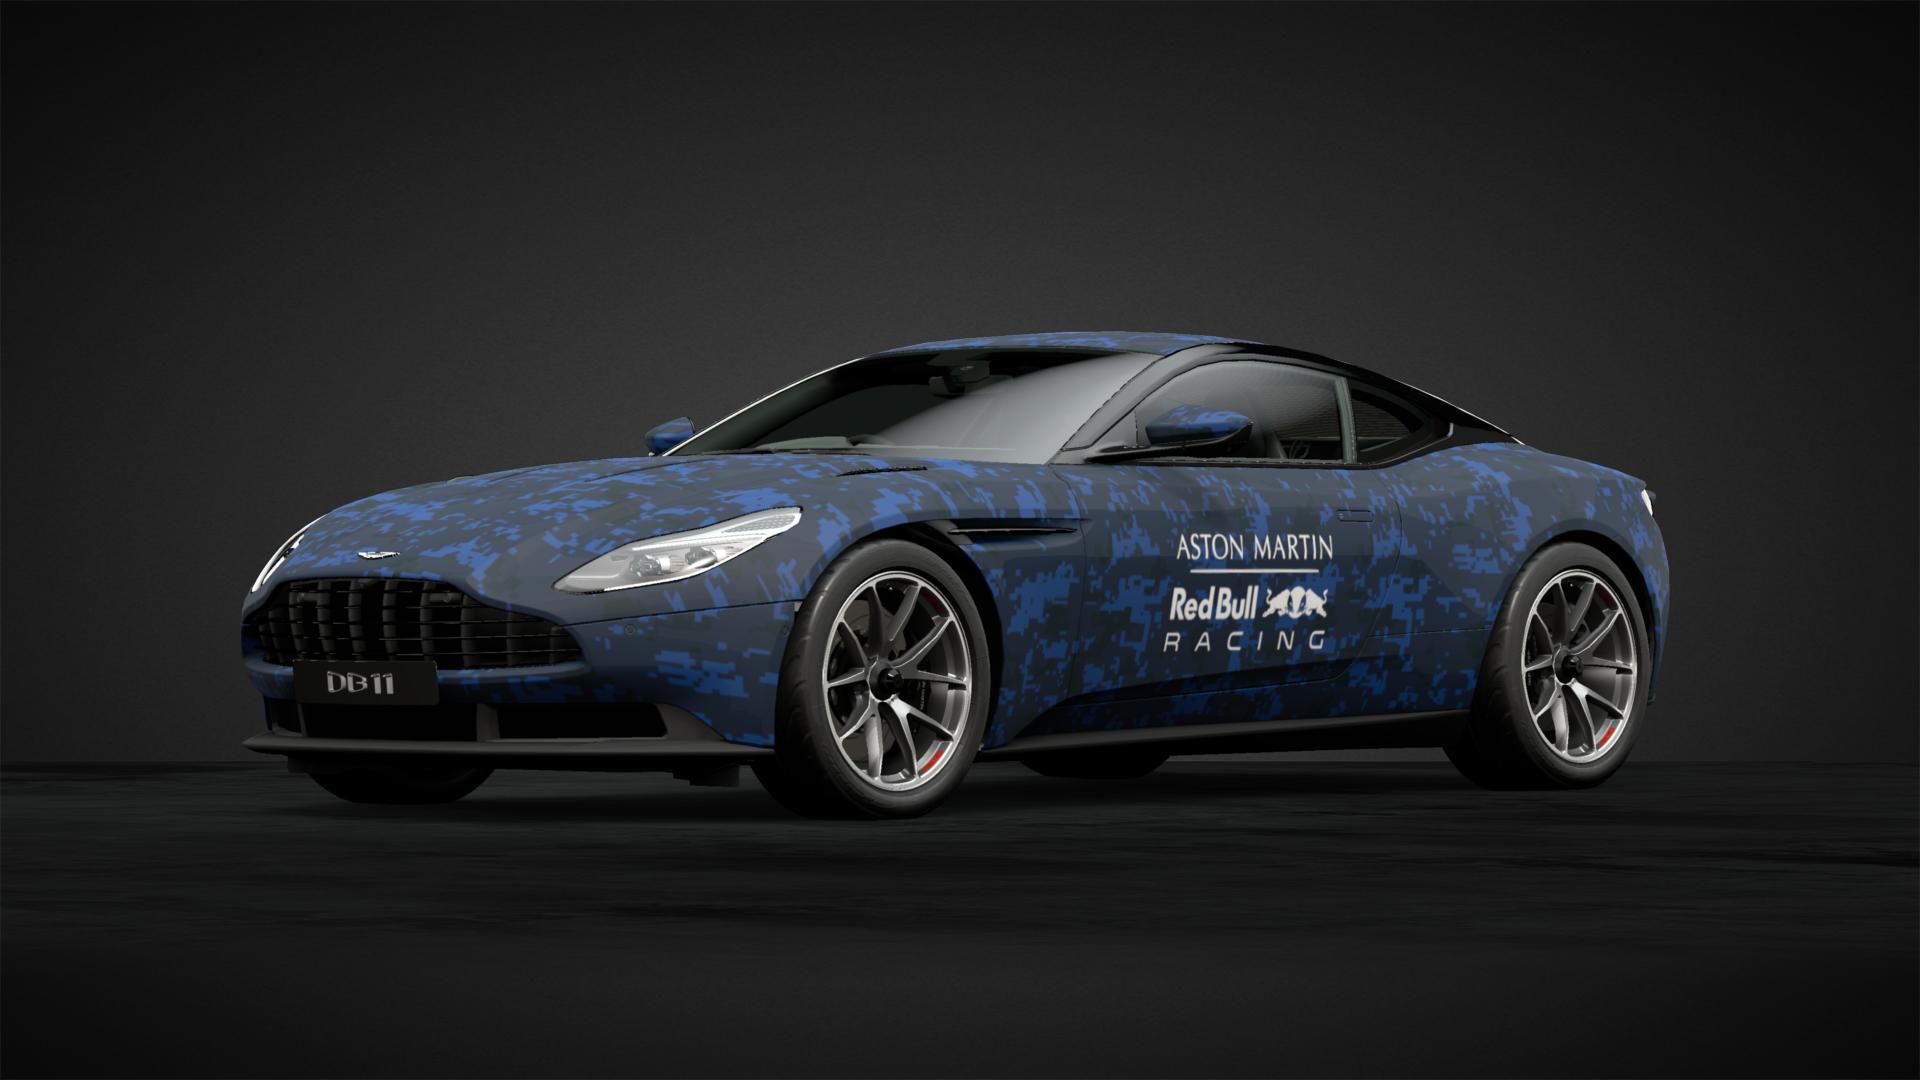 Redbull Aston Martin Db11 Car Livery By Scesg400 Community Gran Turismo Sport